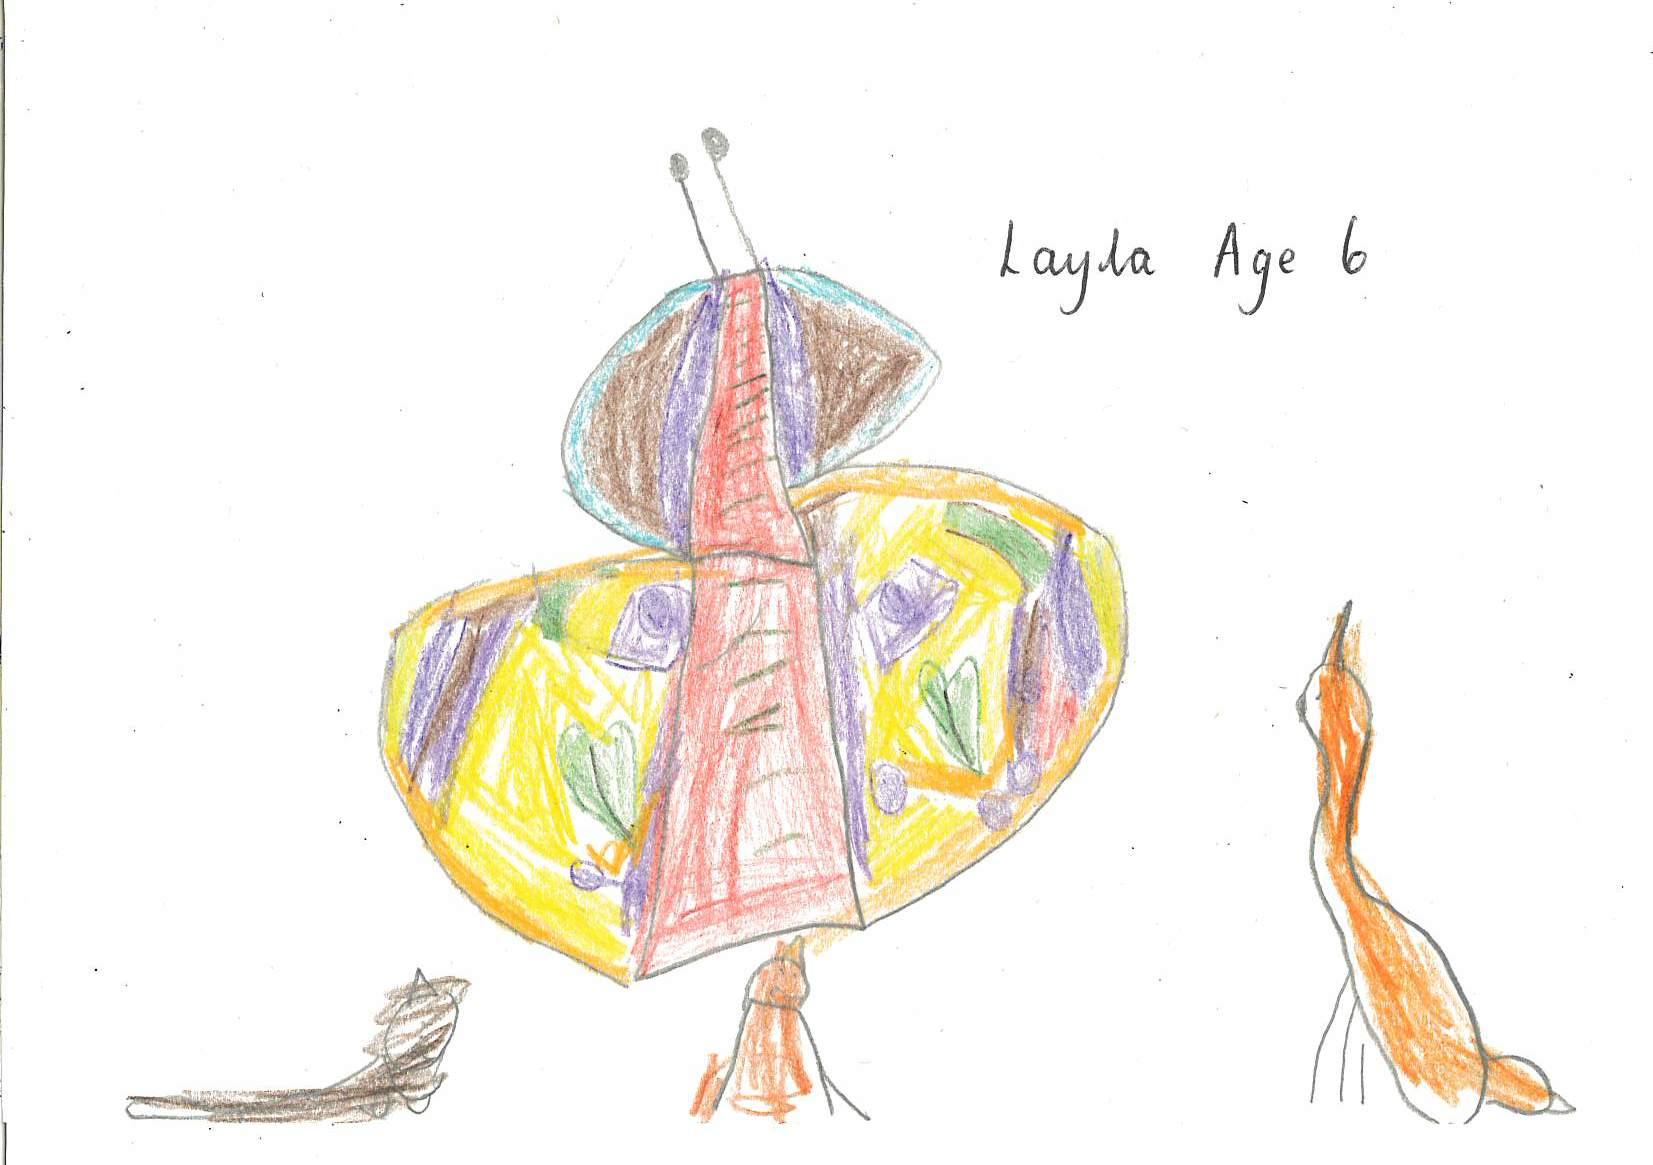 Layla (6)